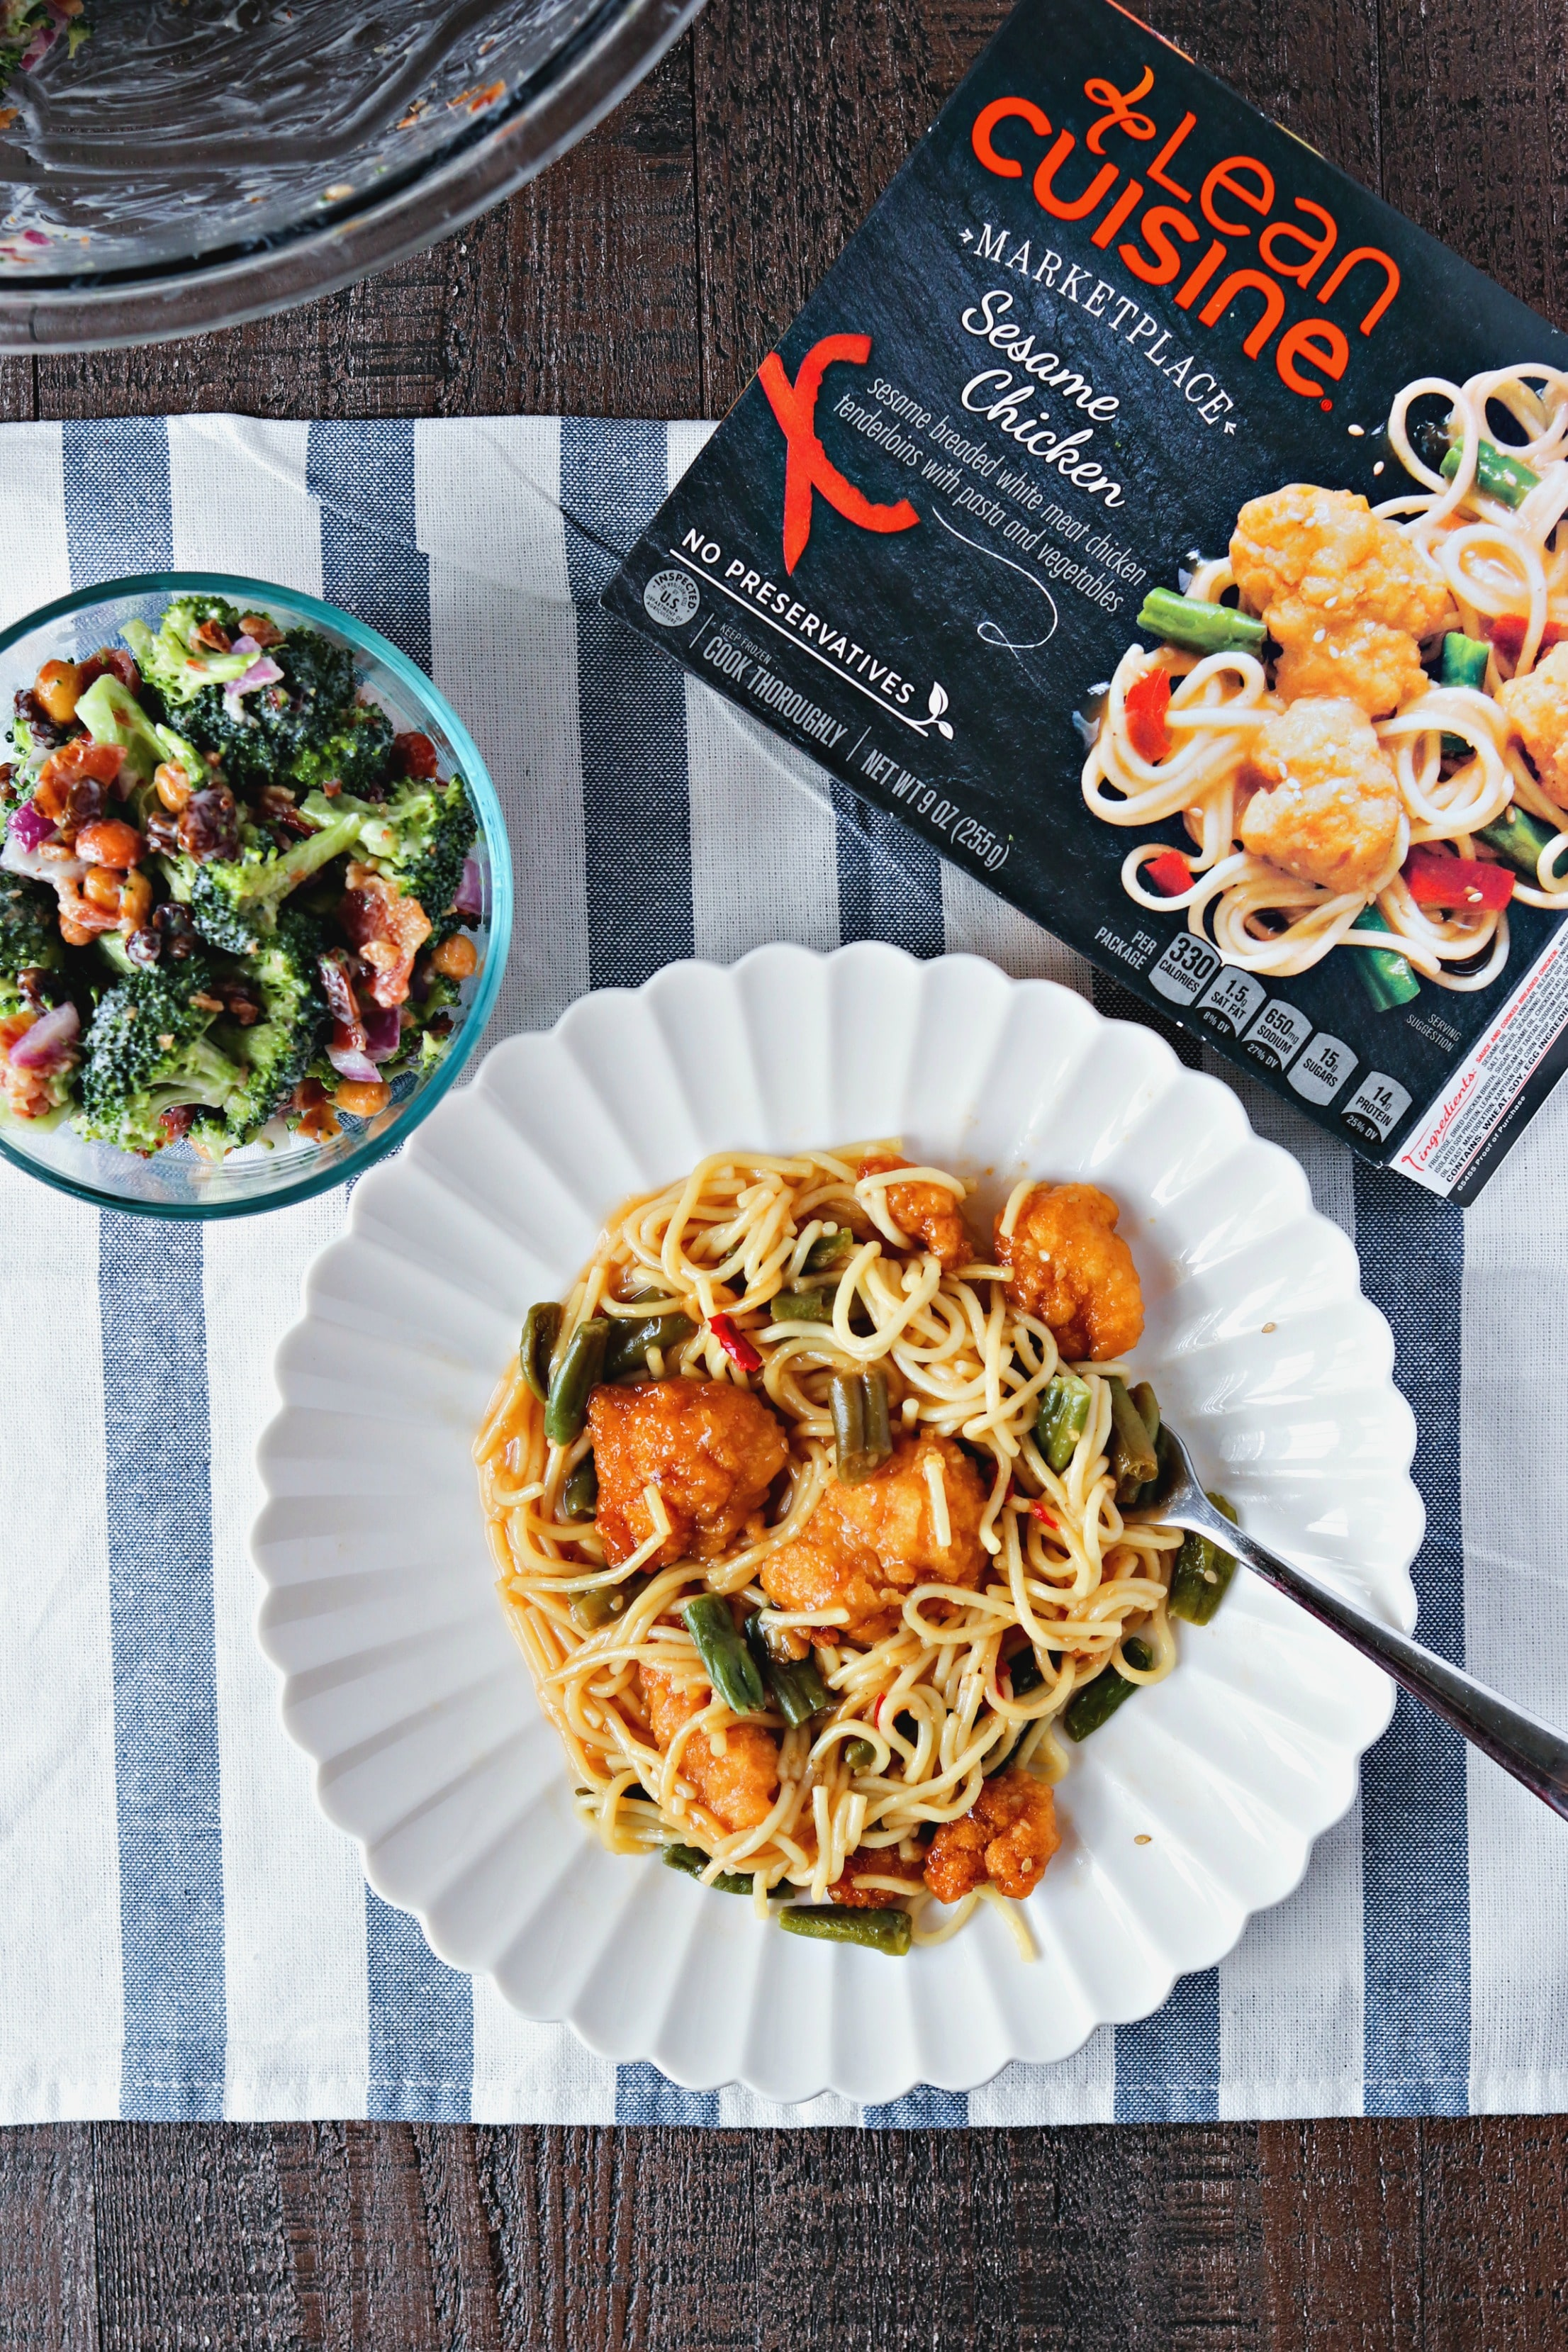 Lean Cuisine Sesame chicken and Fresh Broccoli Salad with Crispy Bacon